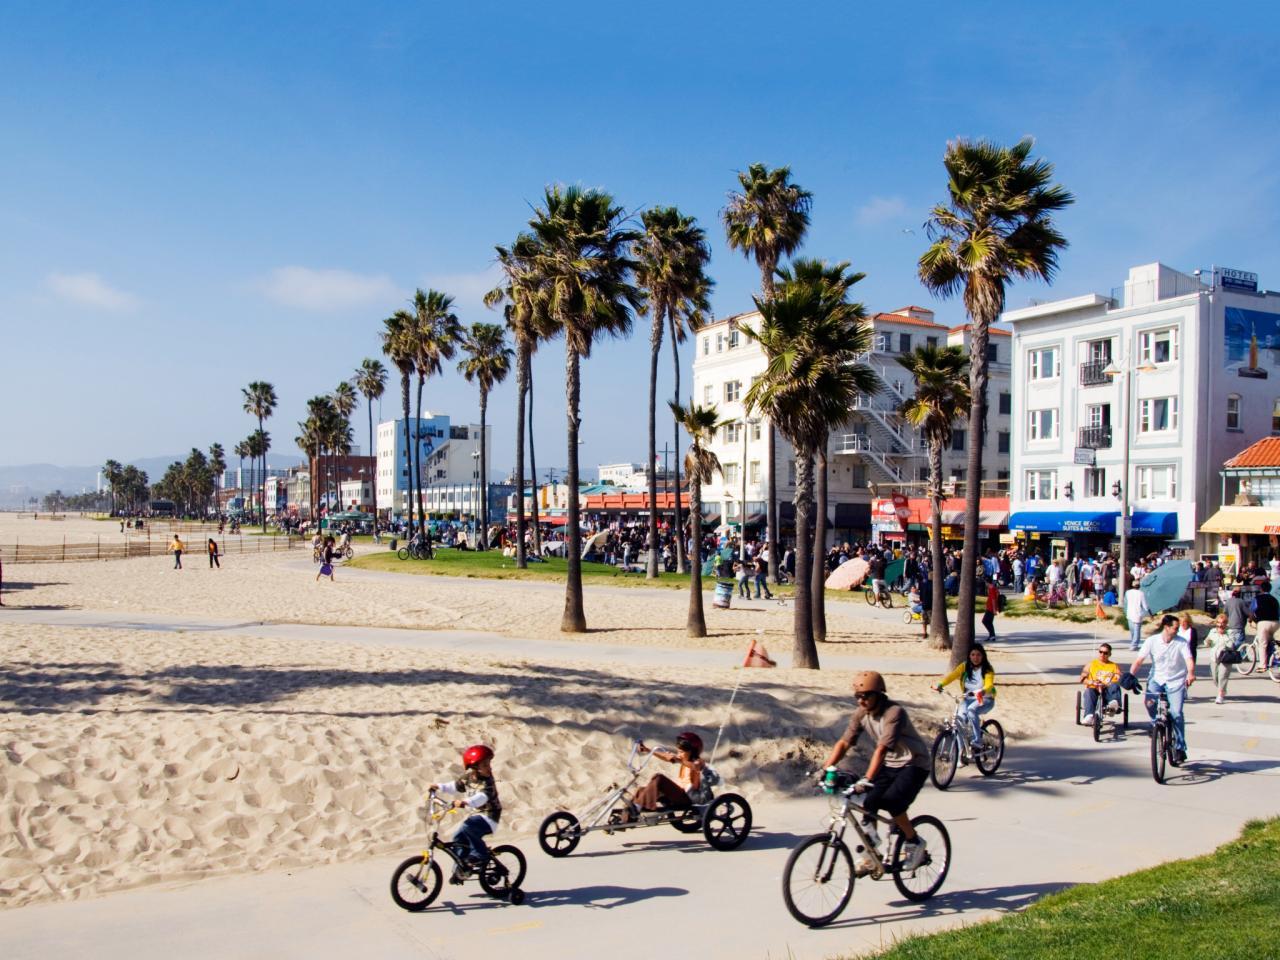 top-california-beach-getaways-venice-beach.jpg.rend.tccom.1280.960